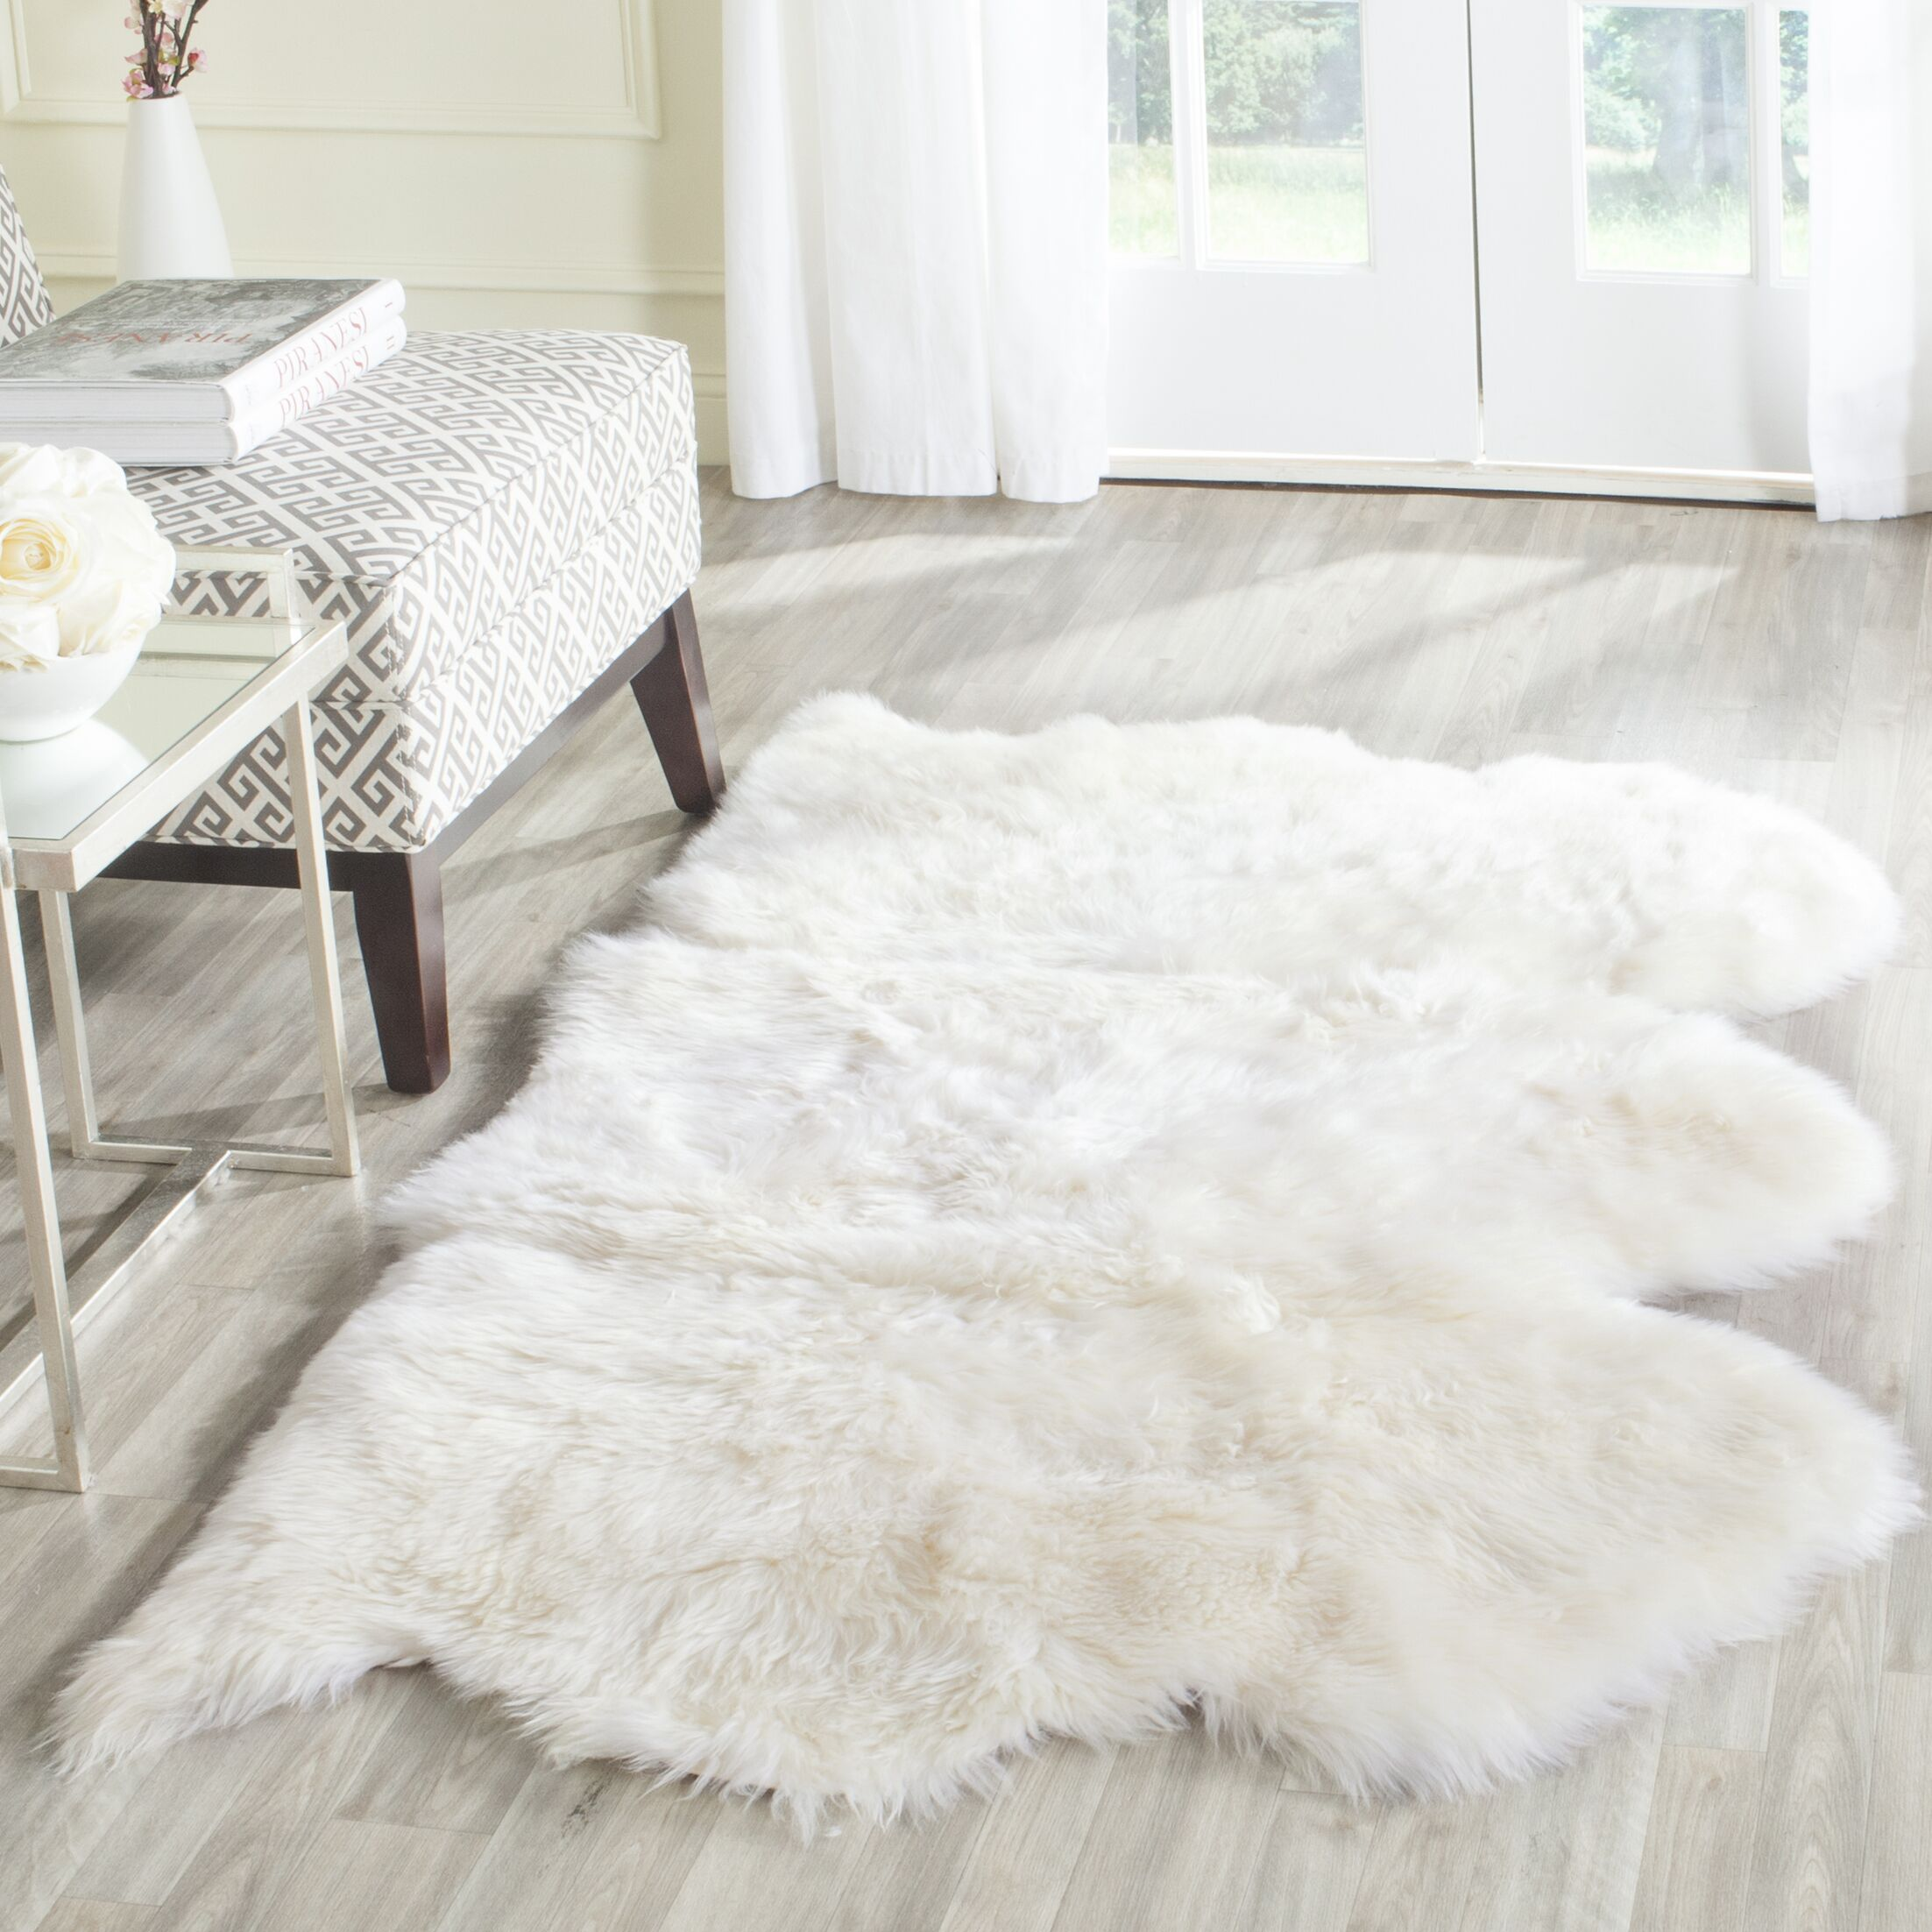 Allison Hand-Woven Faux Sheepskin White Area Rug Rug Size: Novelty 3' x 5'